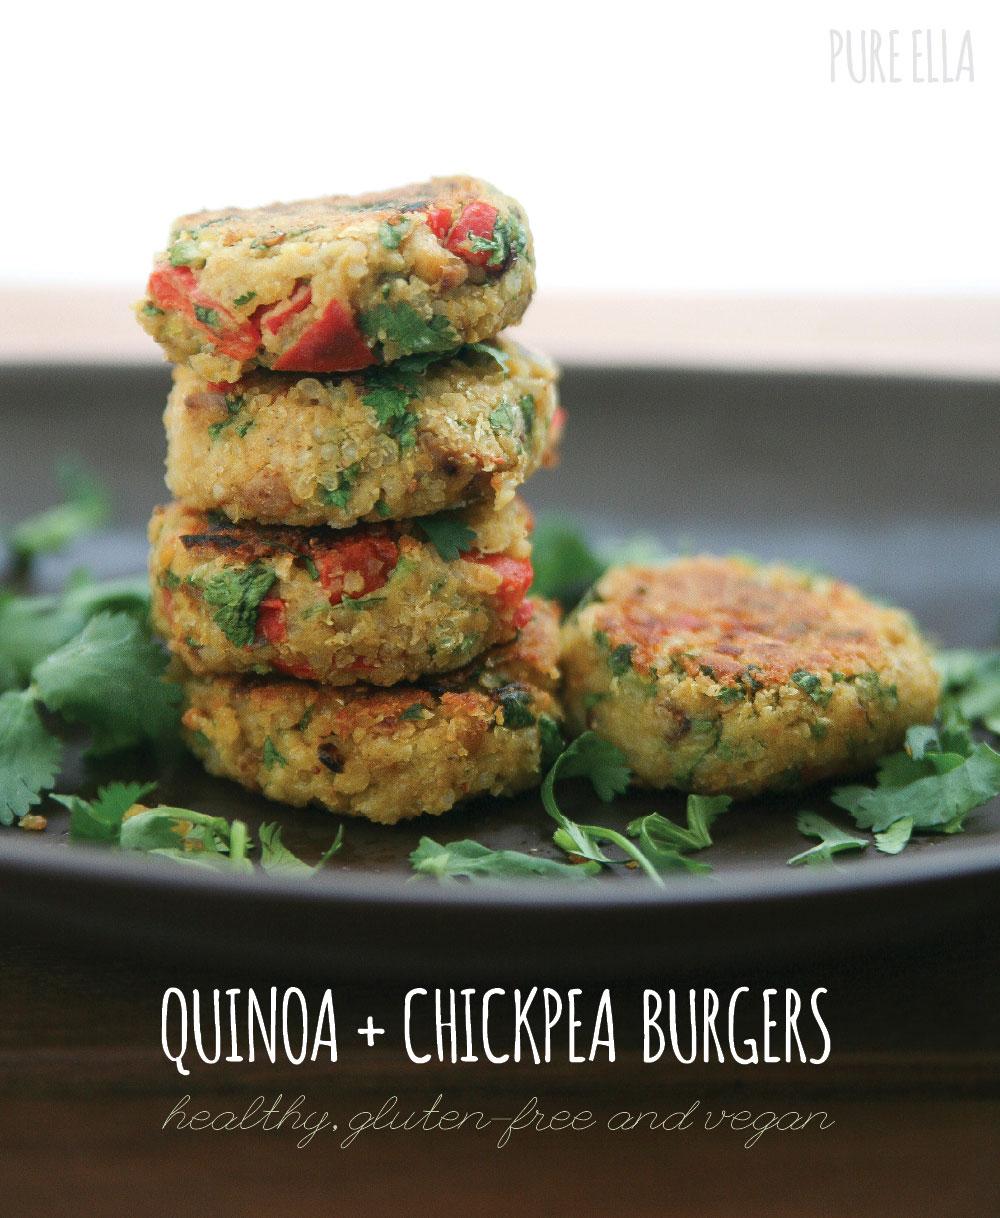 Pure-Ella-Quinoa-Chickpea-Burgers-vegan-gluten-free